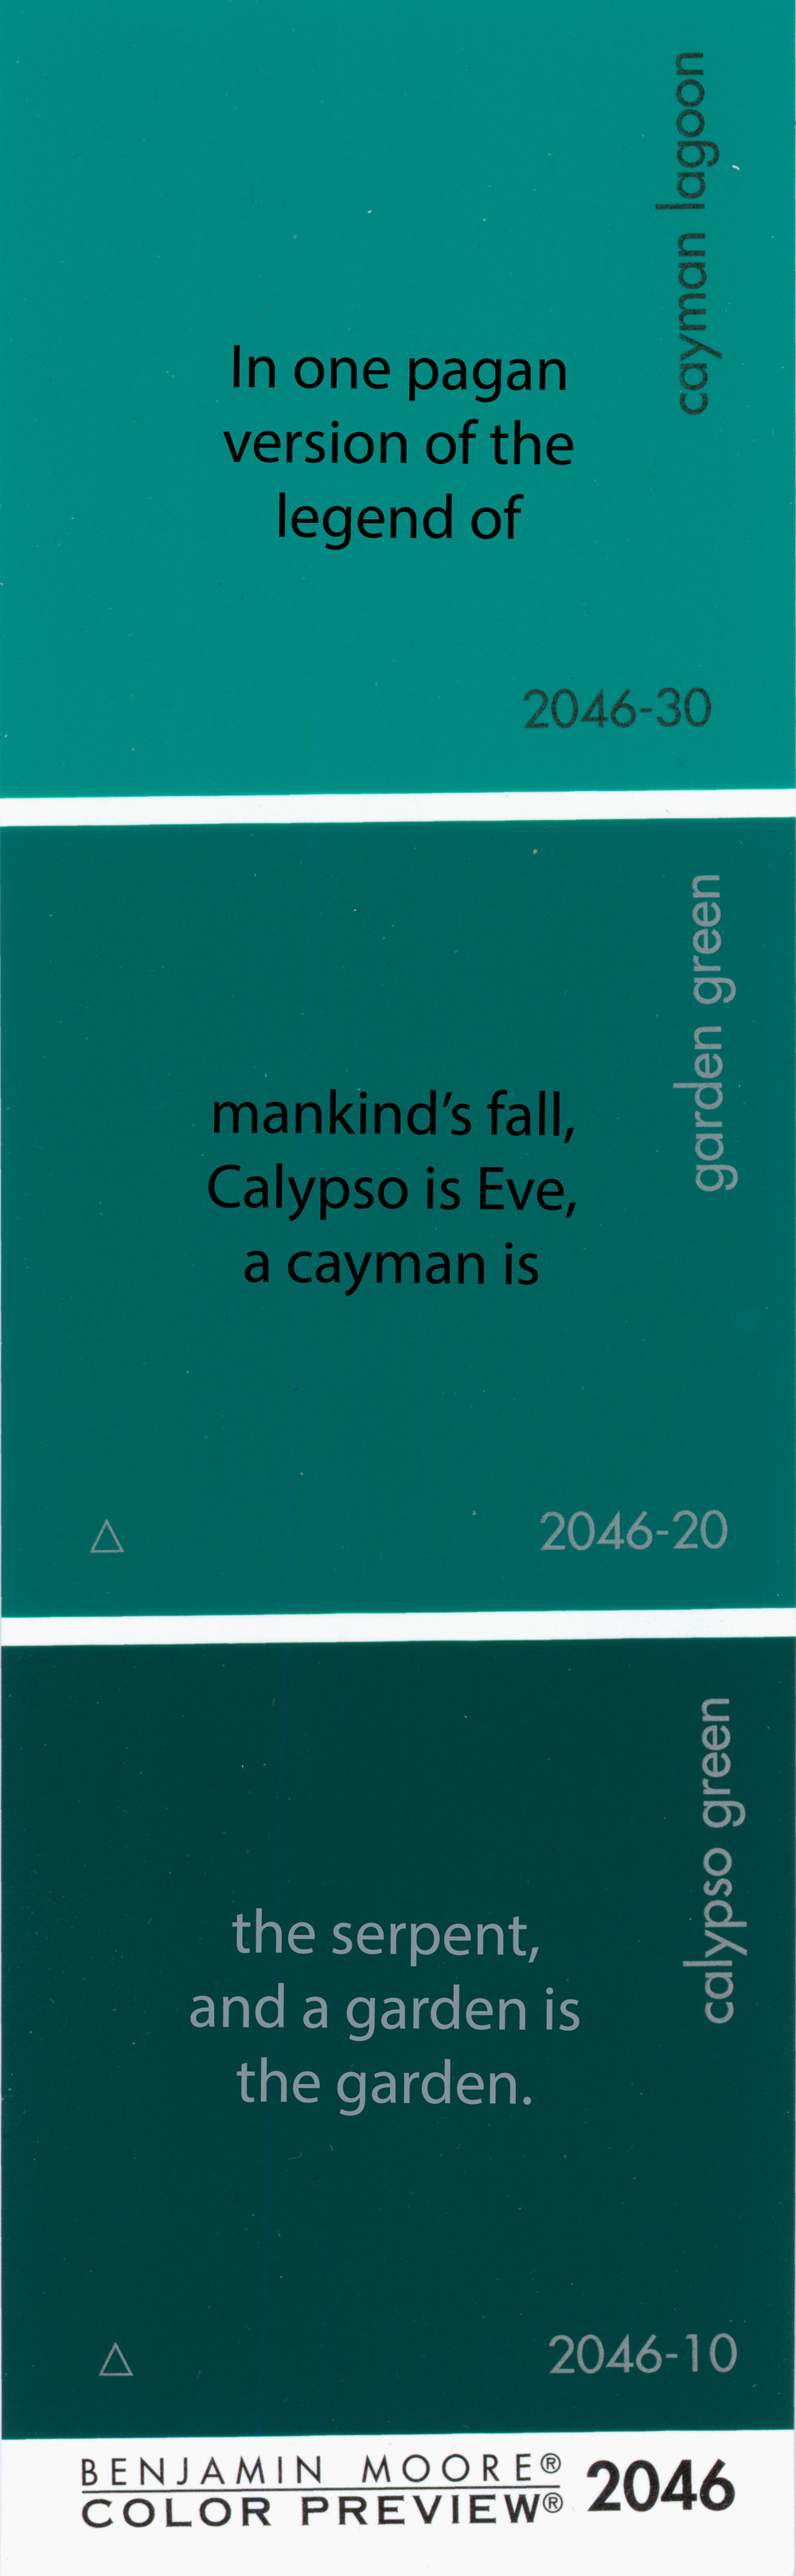 CalypsoAsEve-01.jpg